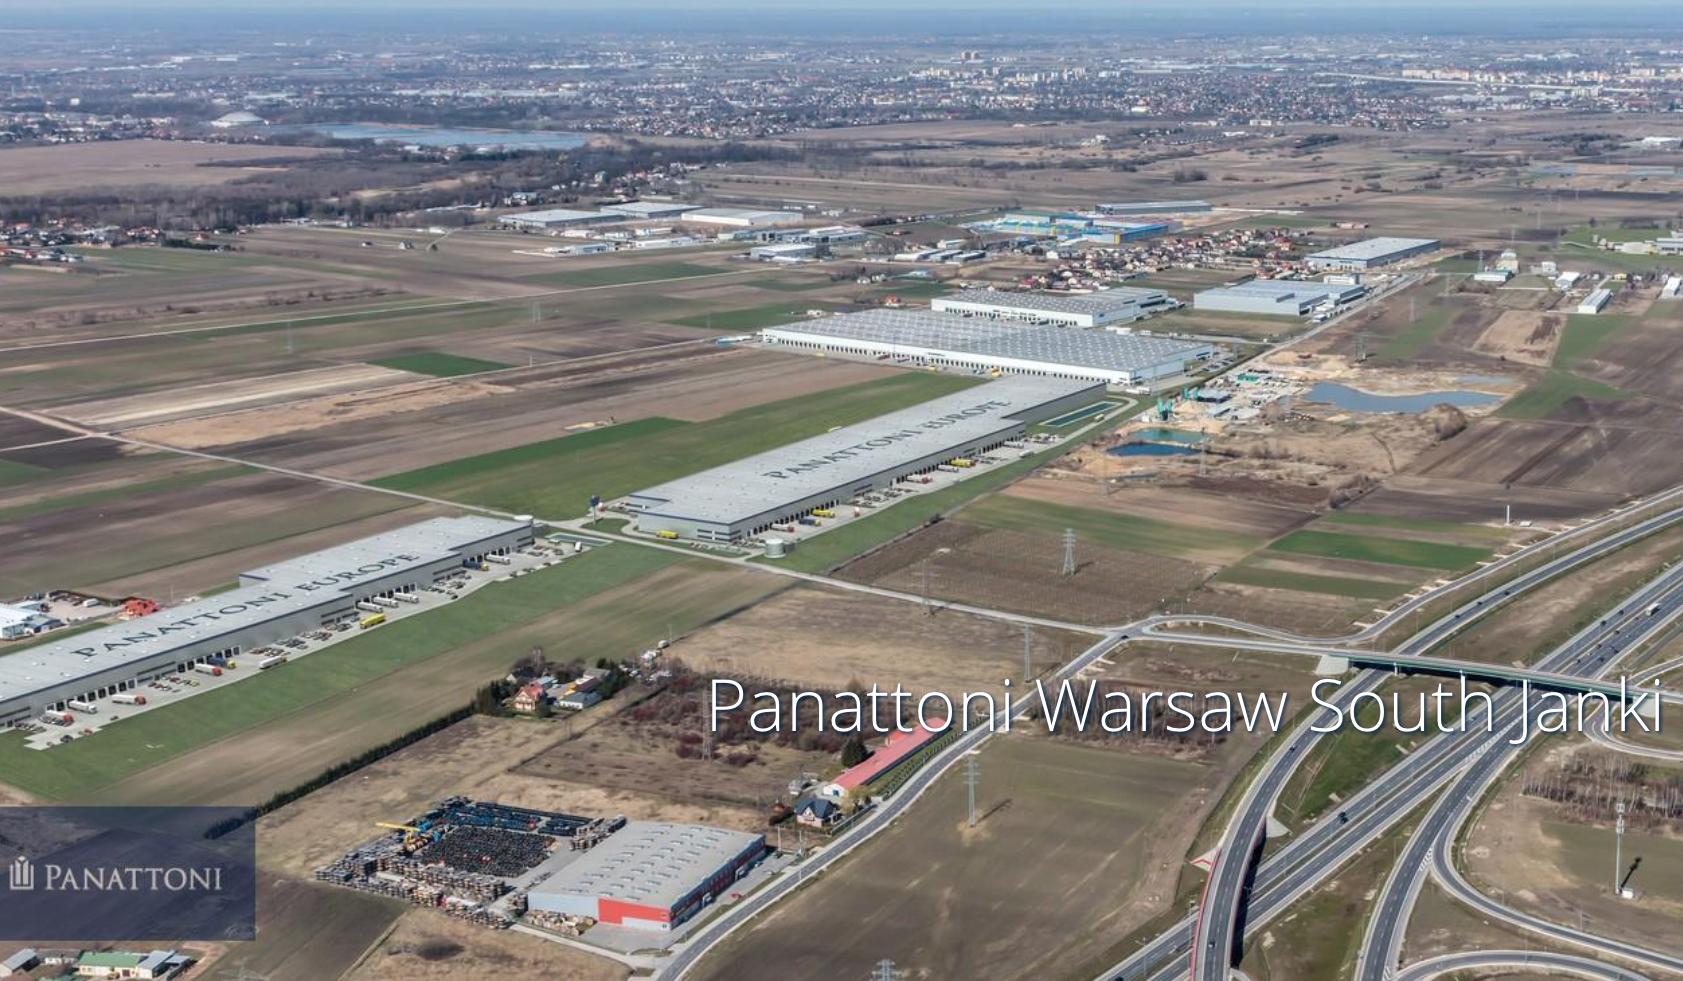 Panattoni Warsaw South Janki